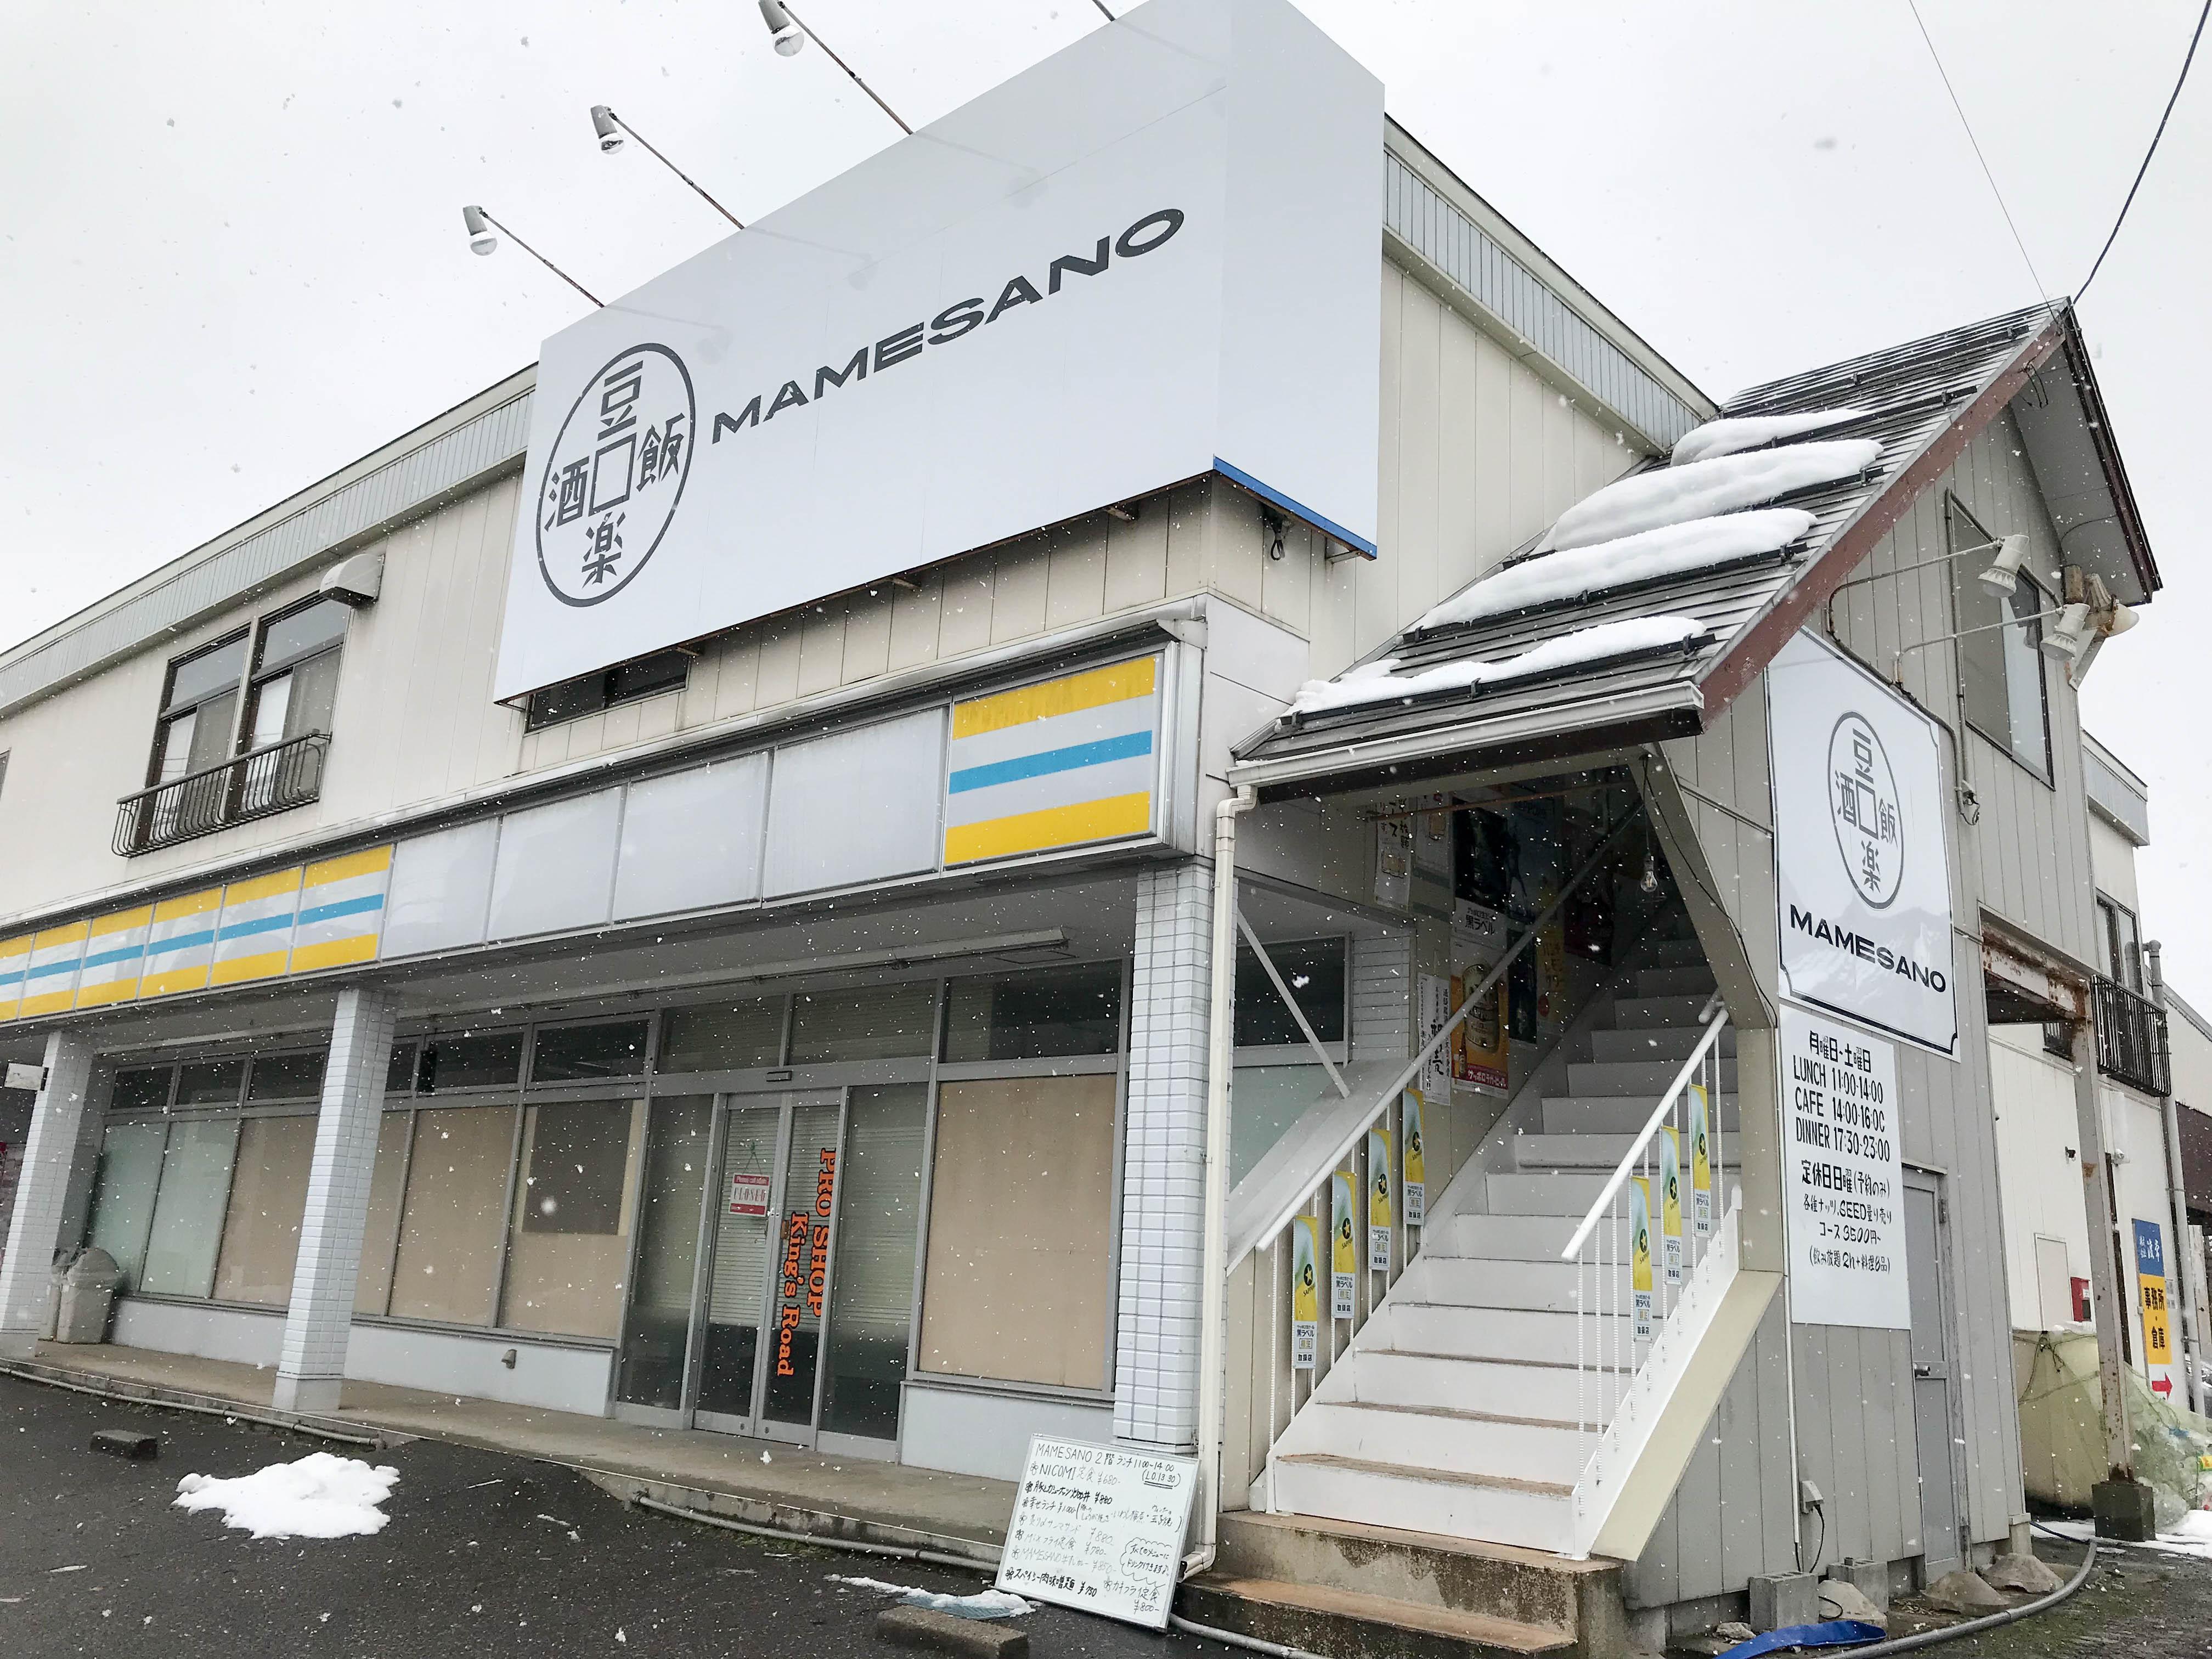 MAMESANO-マメサノ-(新潟市東区石山) 多種多様な豆の量り売りコーナーがあるご飯屋さん。チョコミントアイスもあったよ。